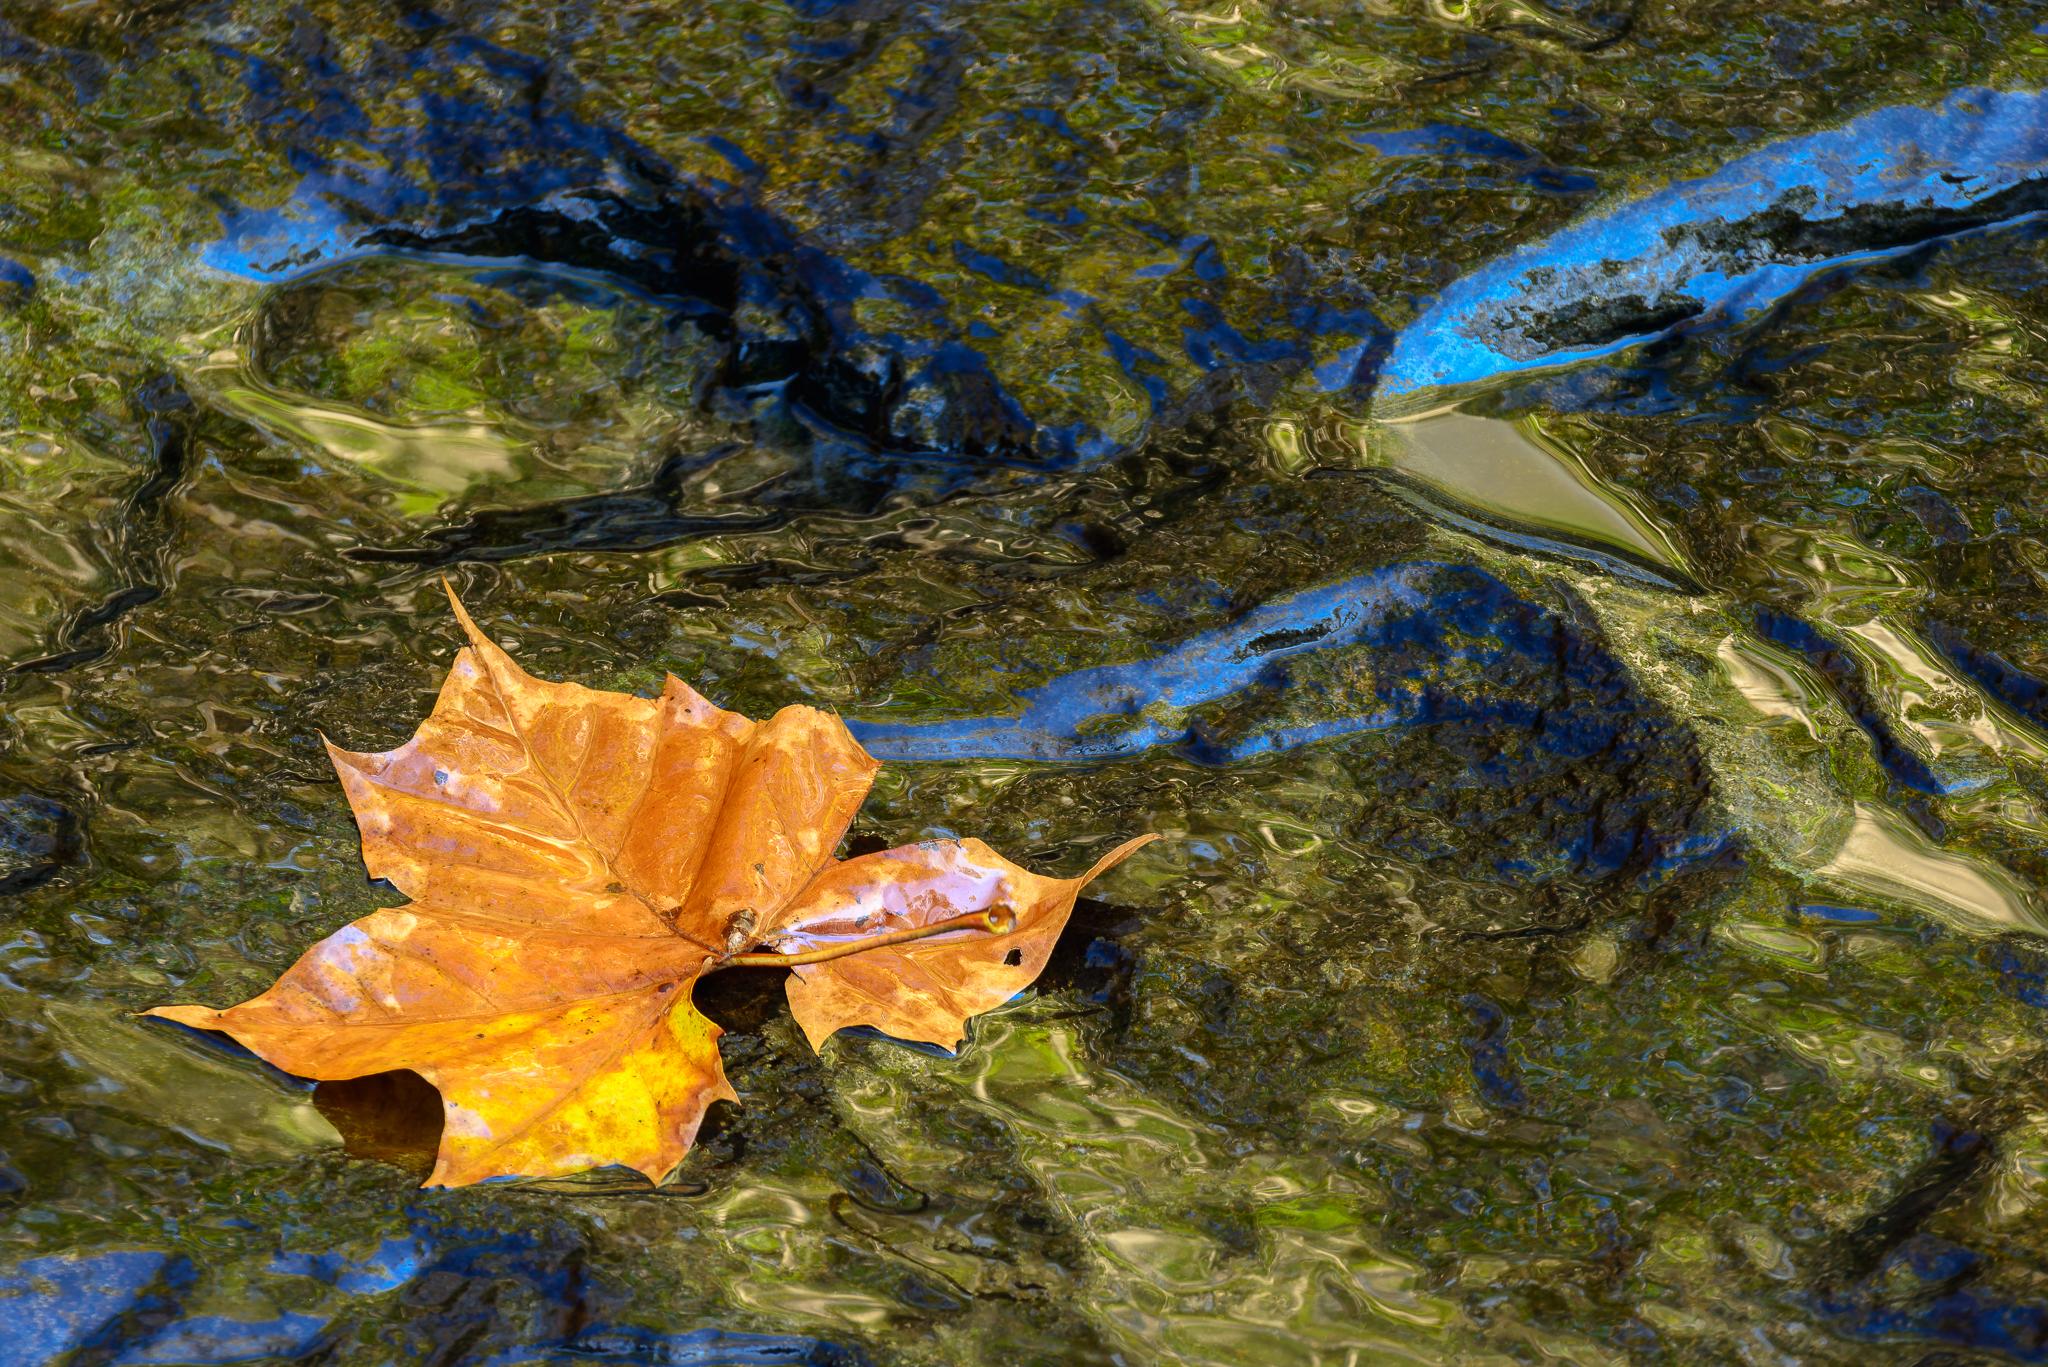 Liquid, laid out. Ohiopyle State Park, PA.